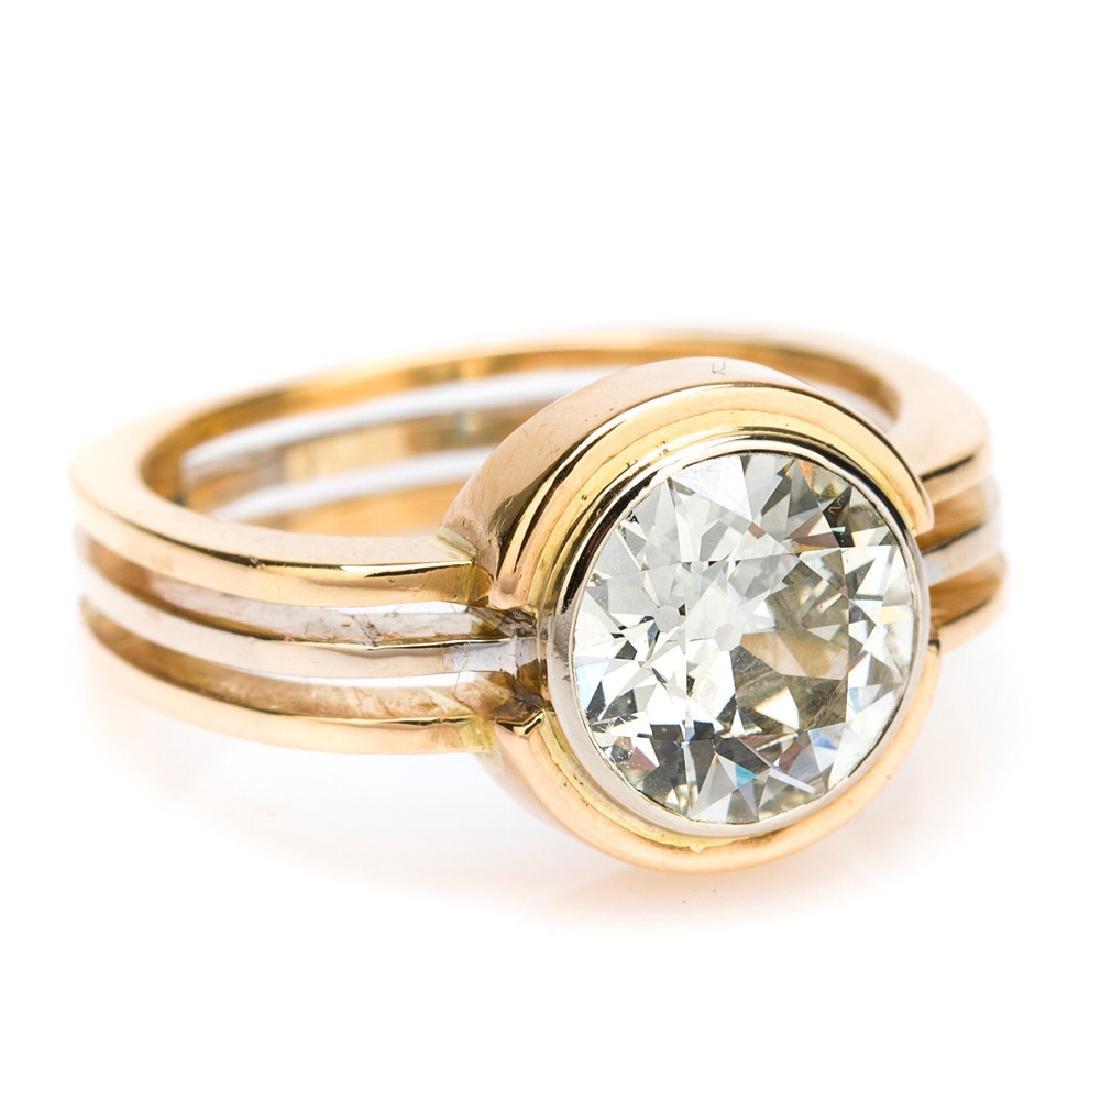 Ring, 2nd Half of 20th Century